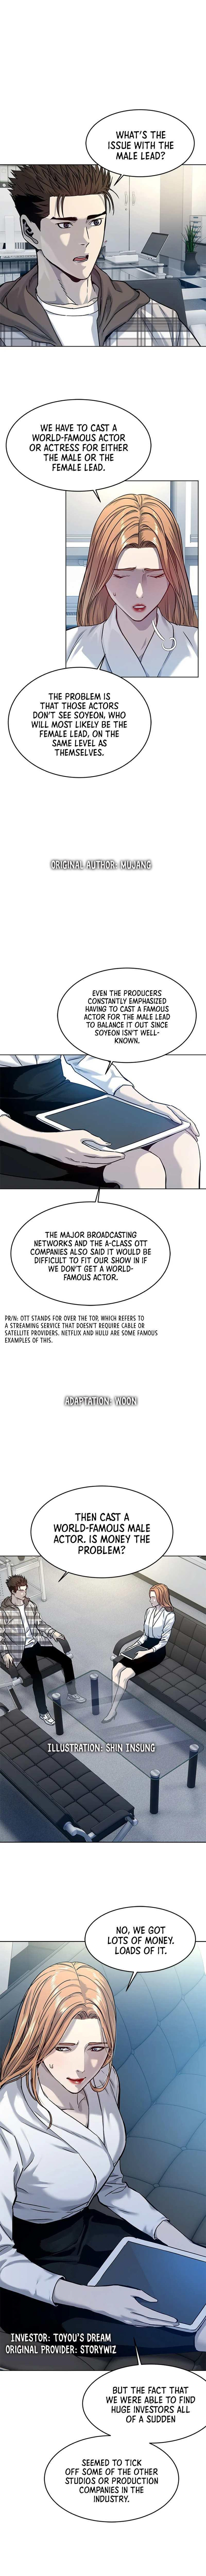 God Of Blackfield Chapter 92 page 2 - Mangakakalots.com